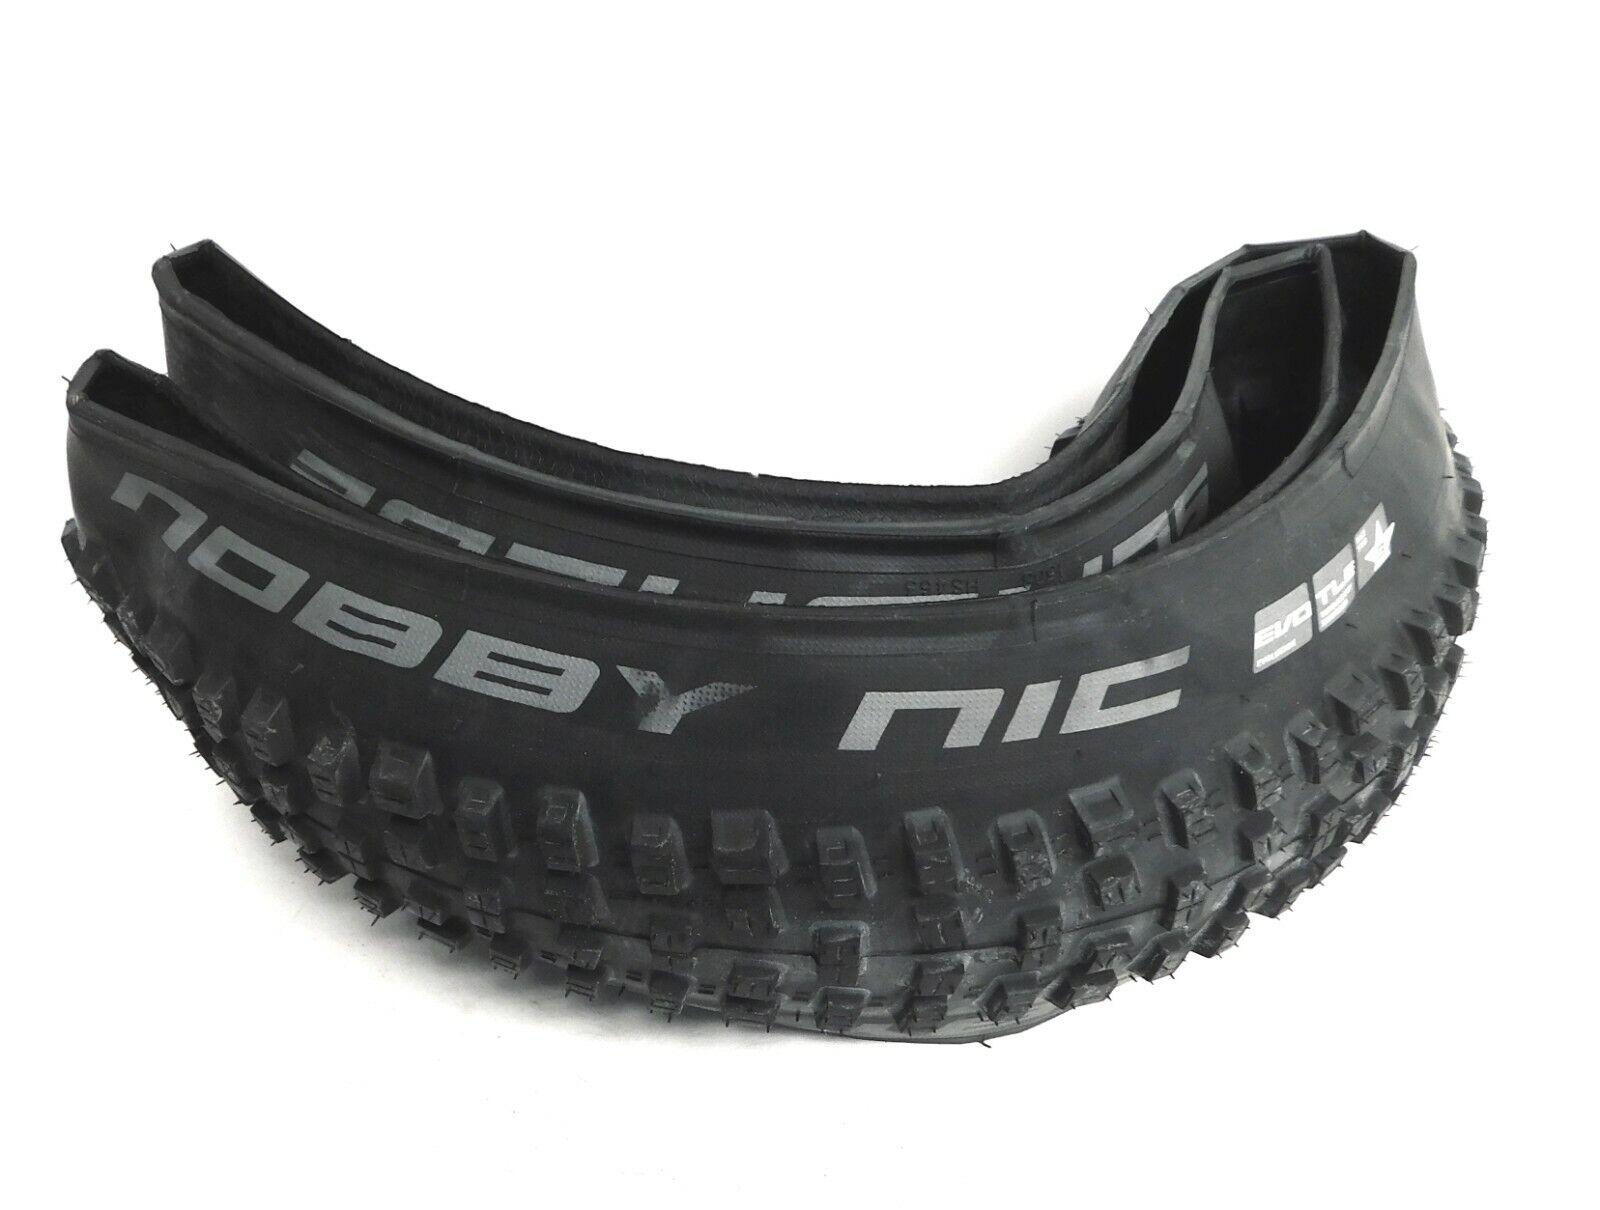 Coat Schwalbe Nobby Nic 27,5x2,25 Model 2015 Price 1 Tyres Ultra Light